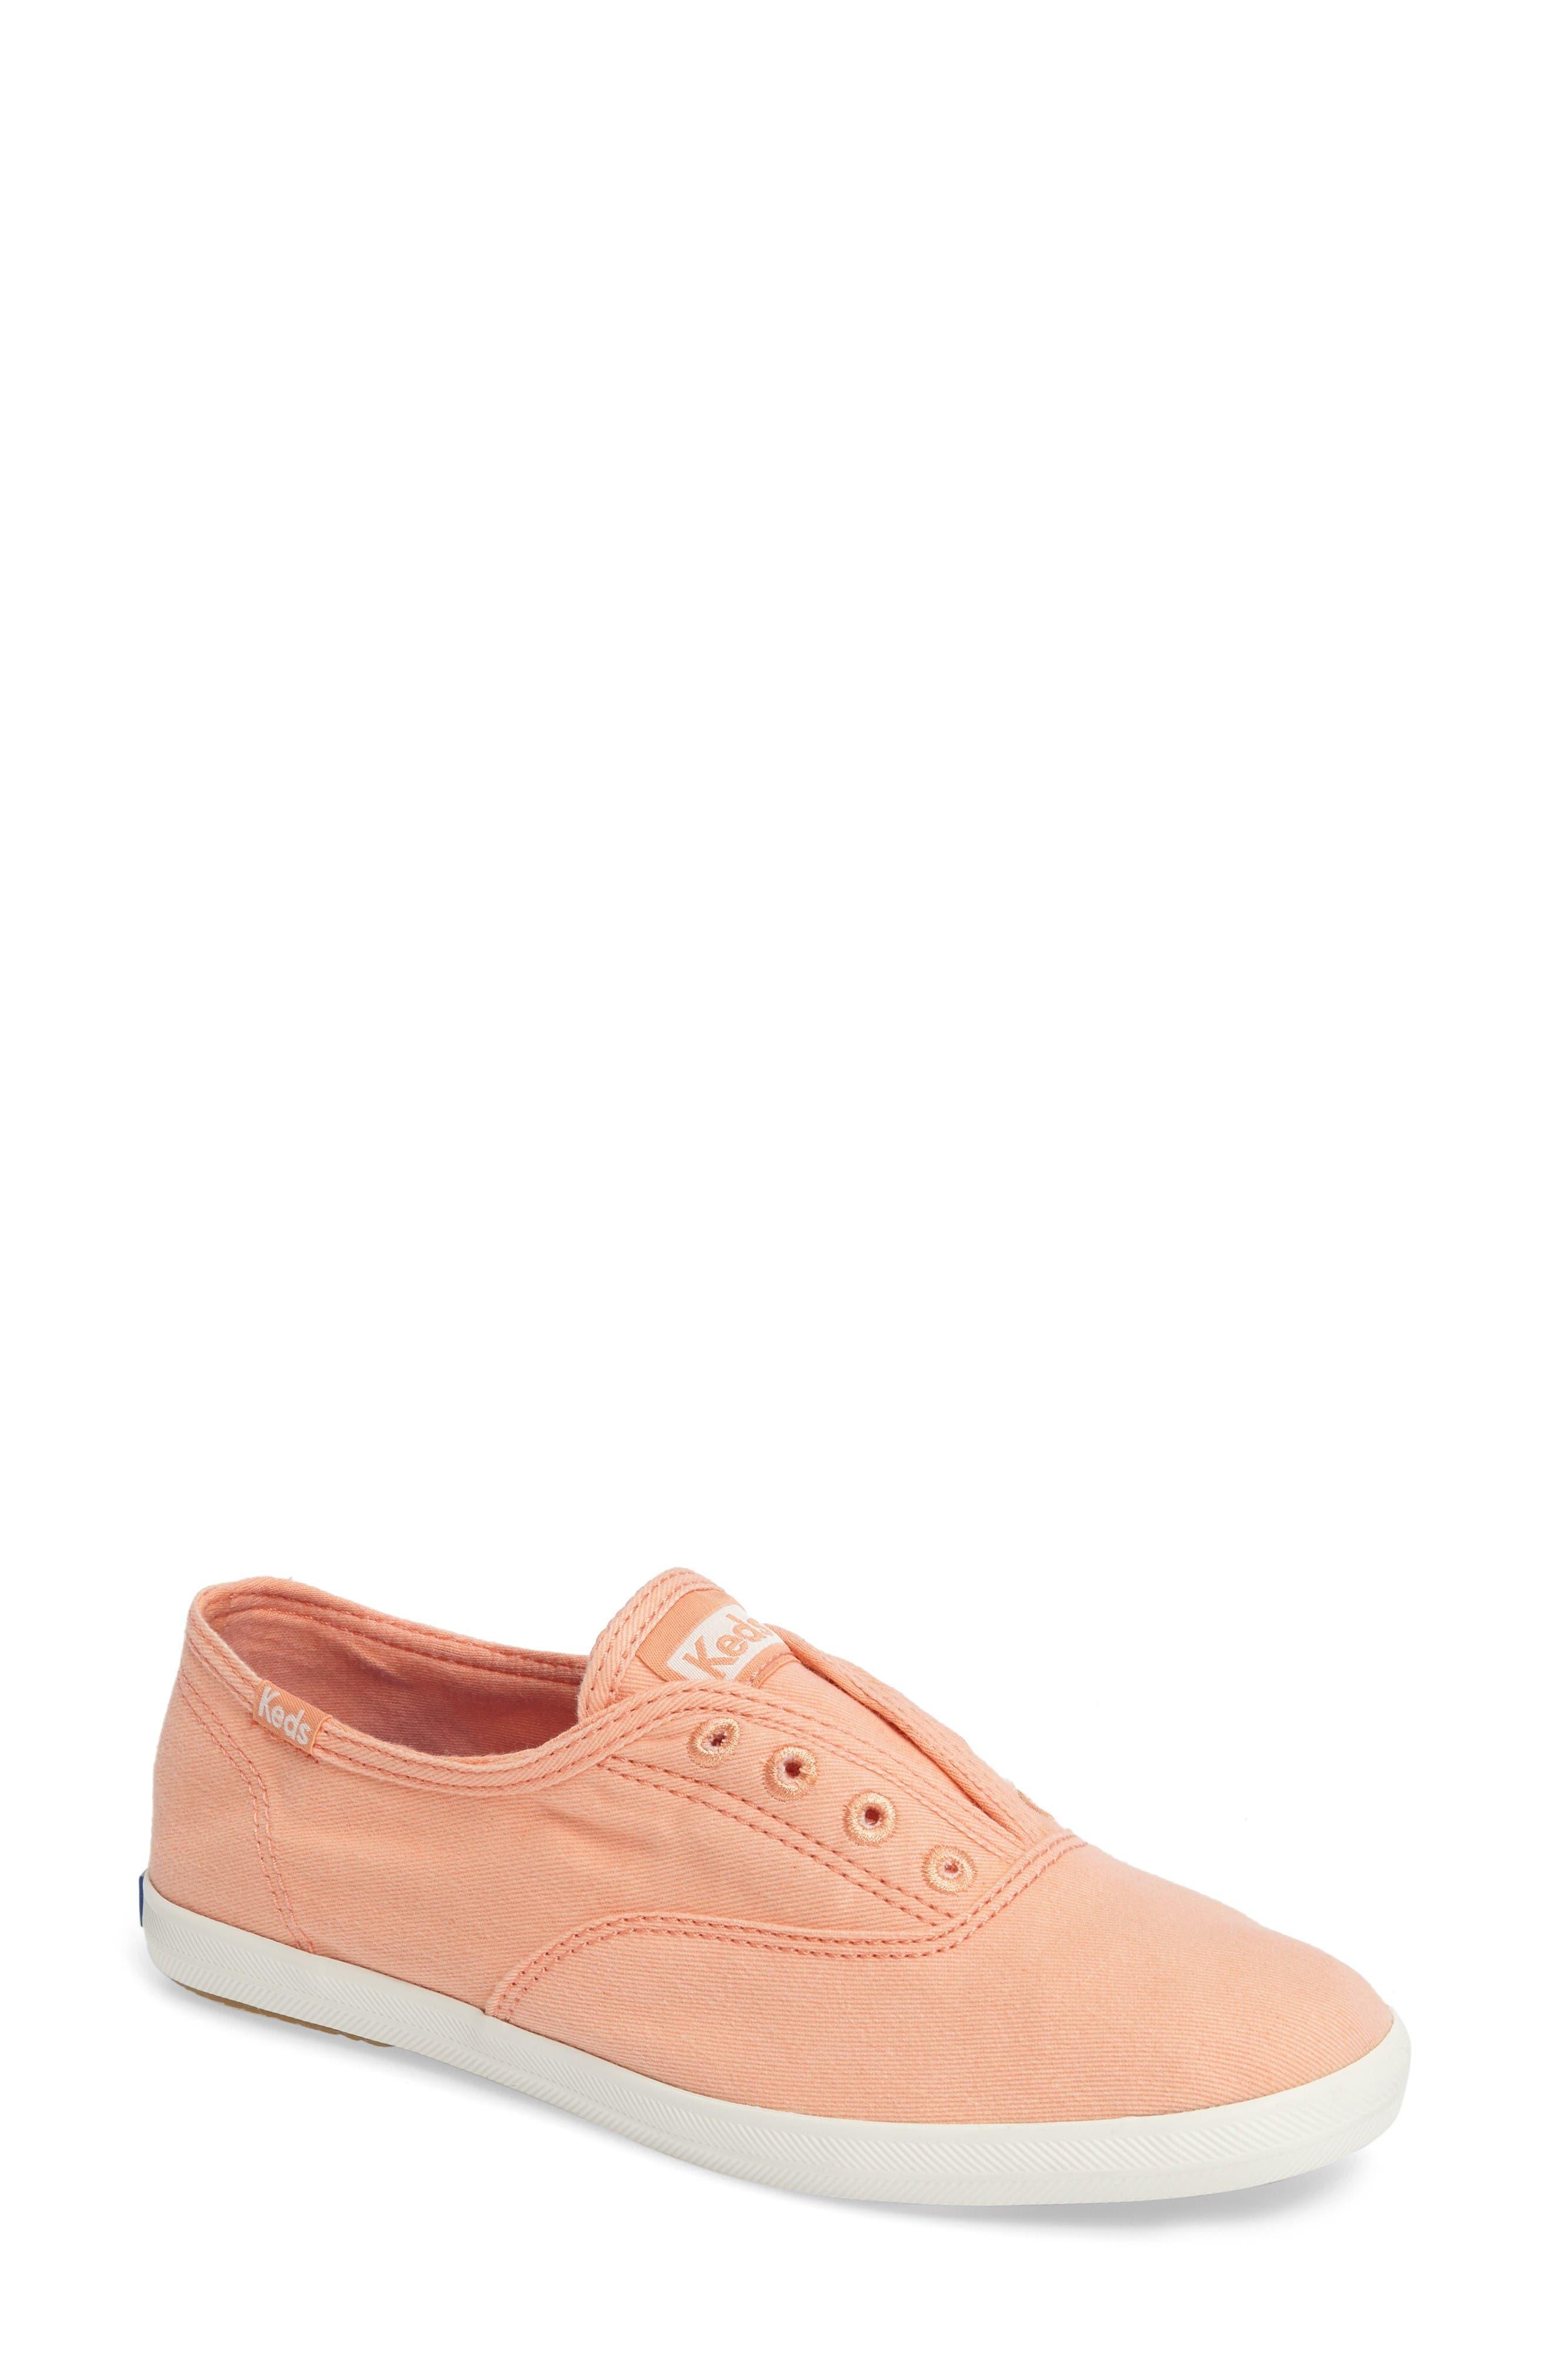 Keds® 'Chillax' Ripstop Slip-On Sneaker (Women)